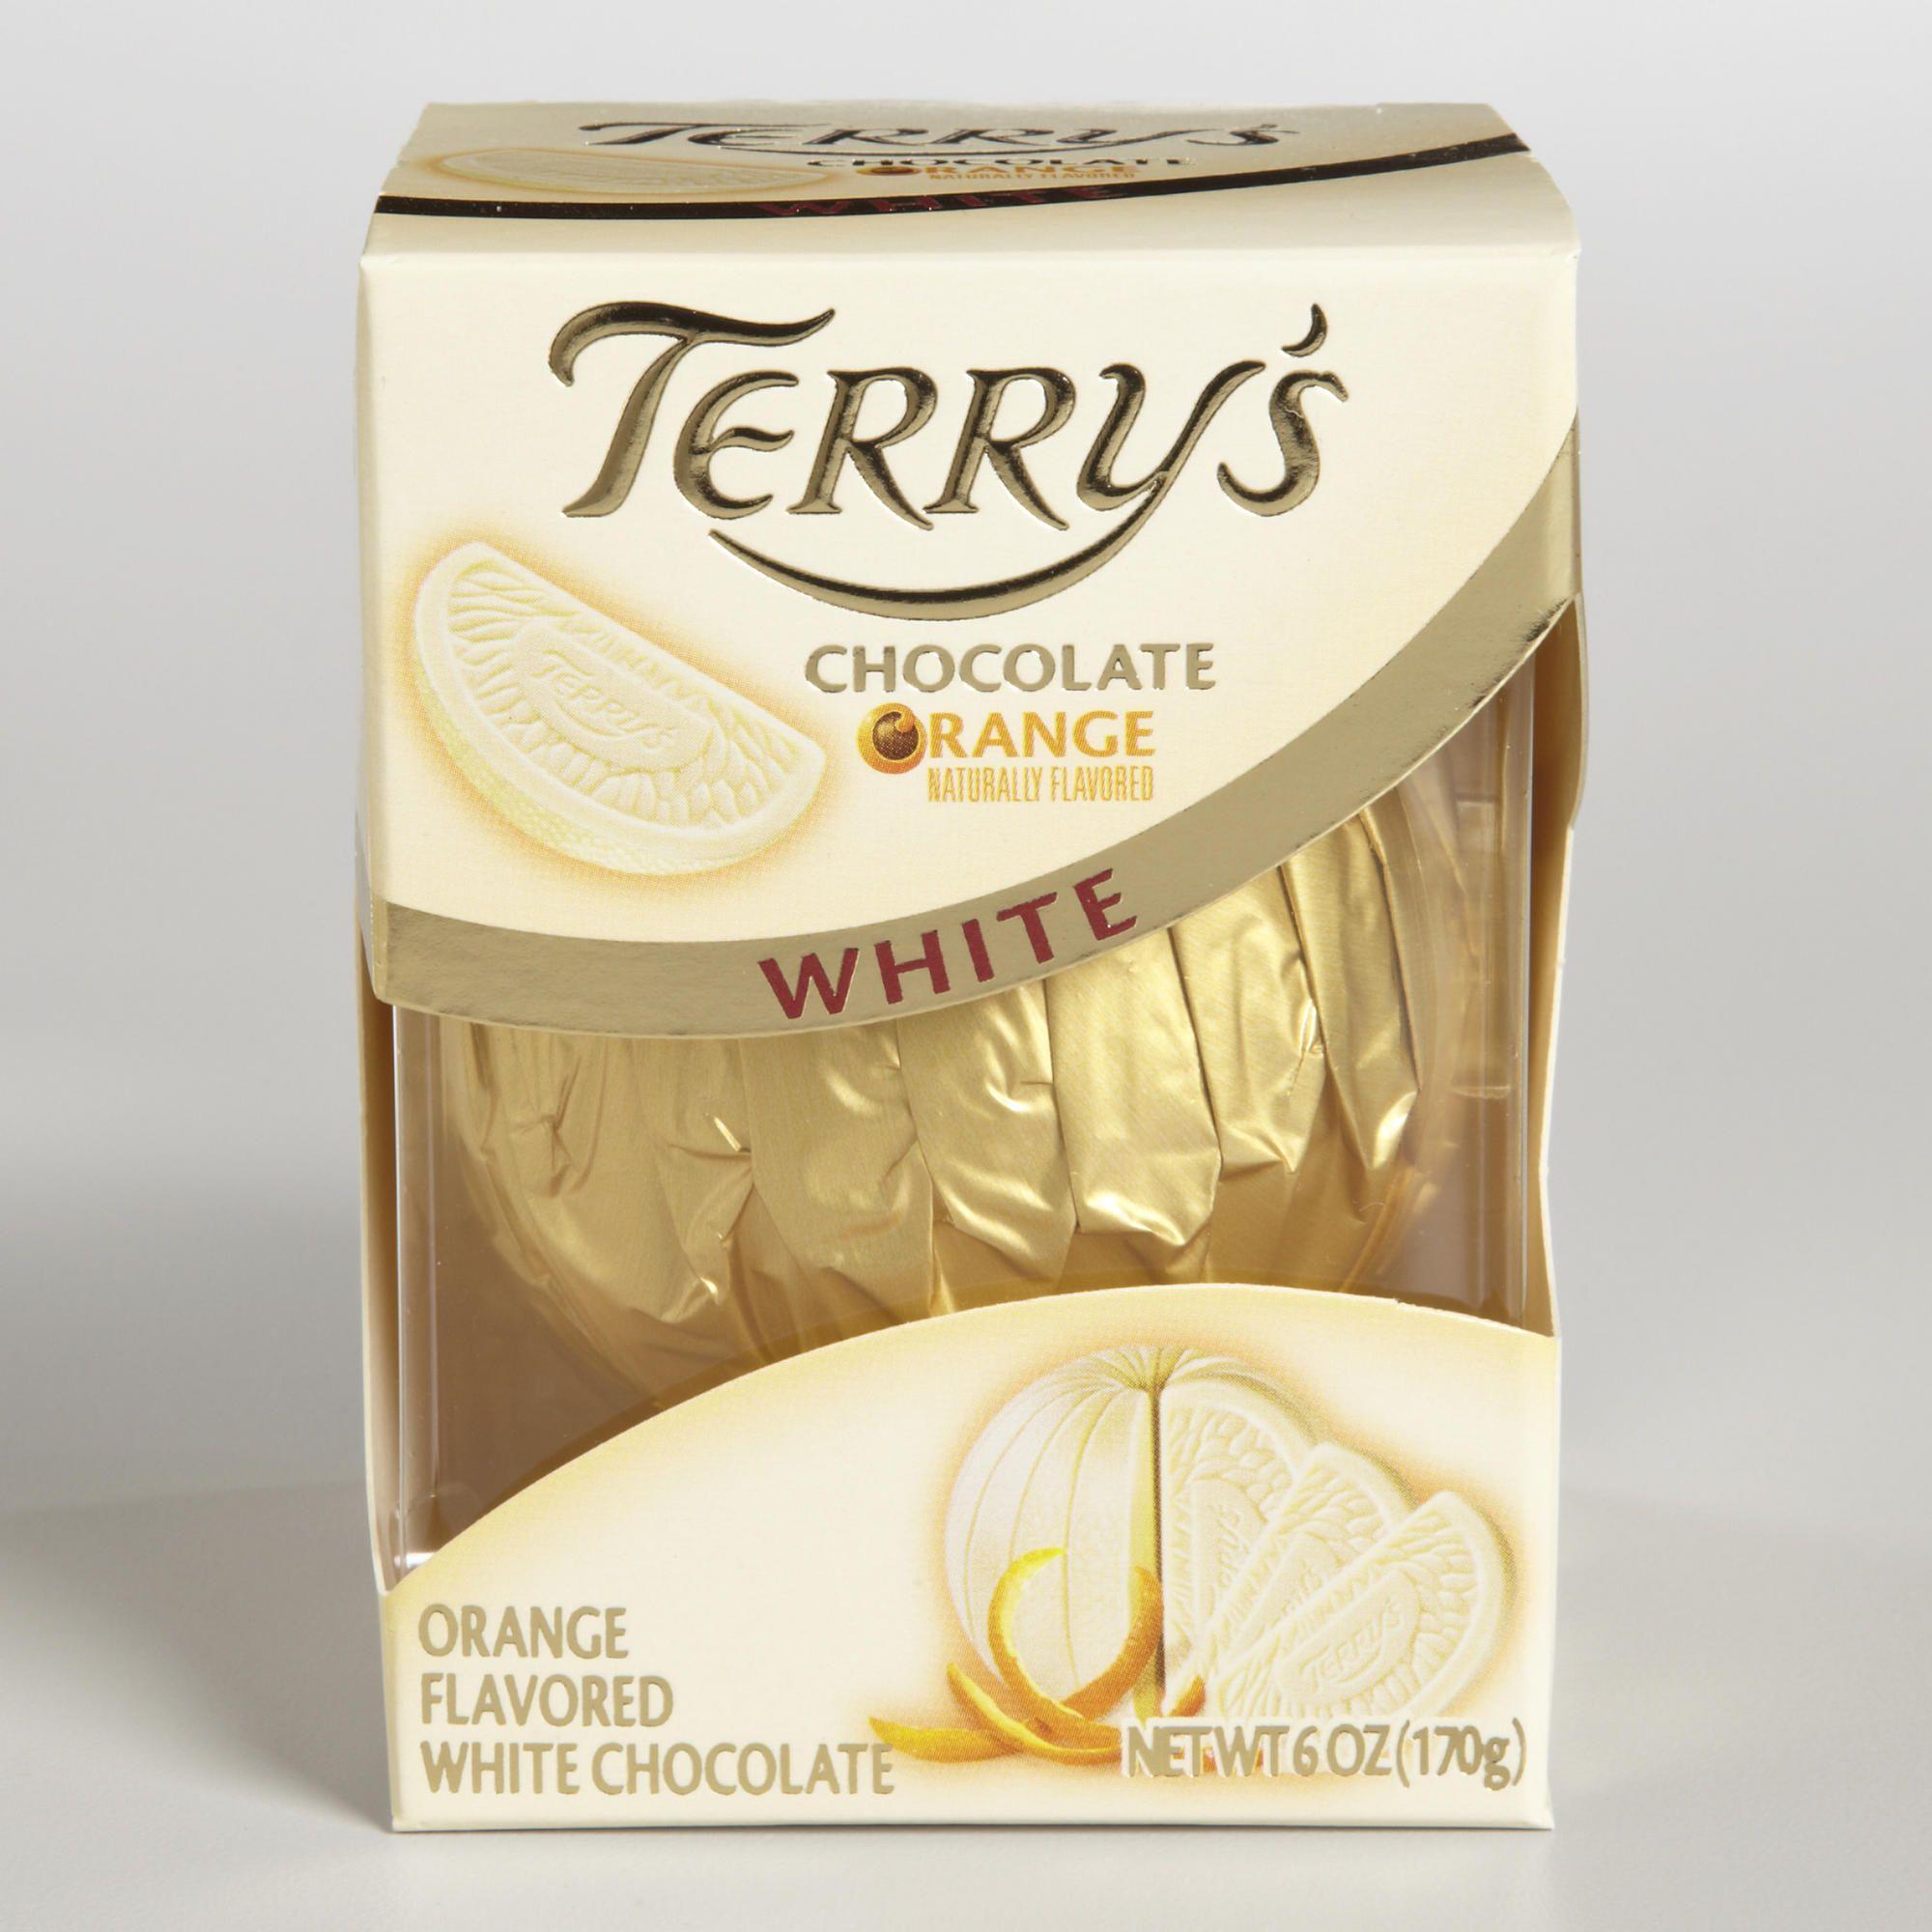 Terrys Chocolate Orange Terrys White Chocolate Orange